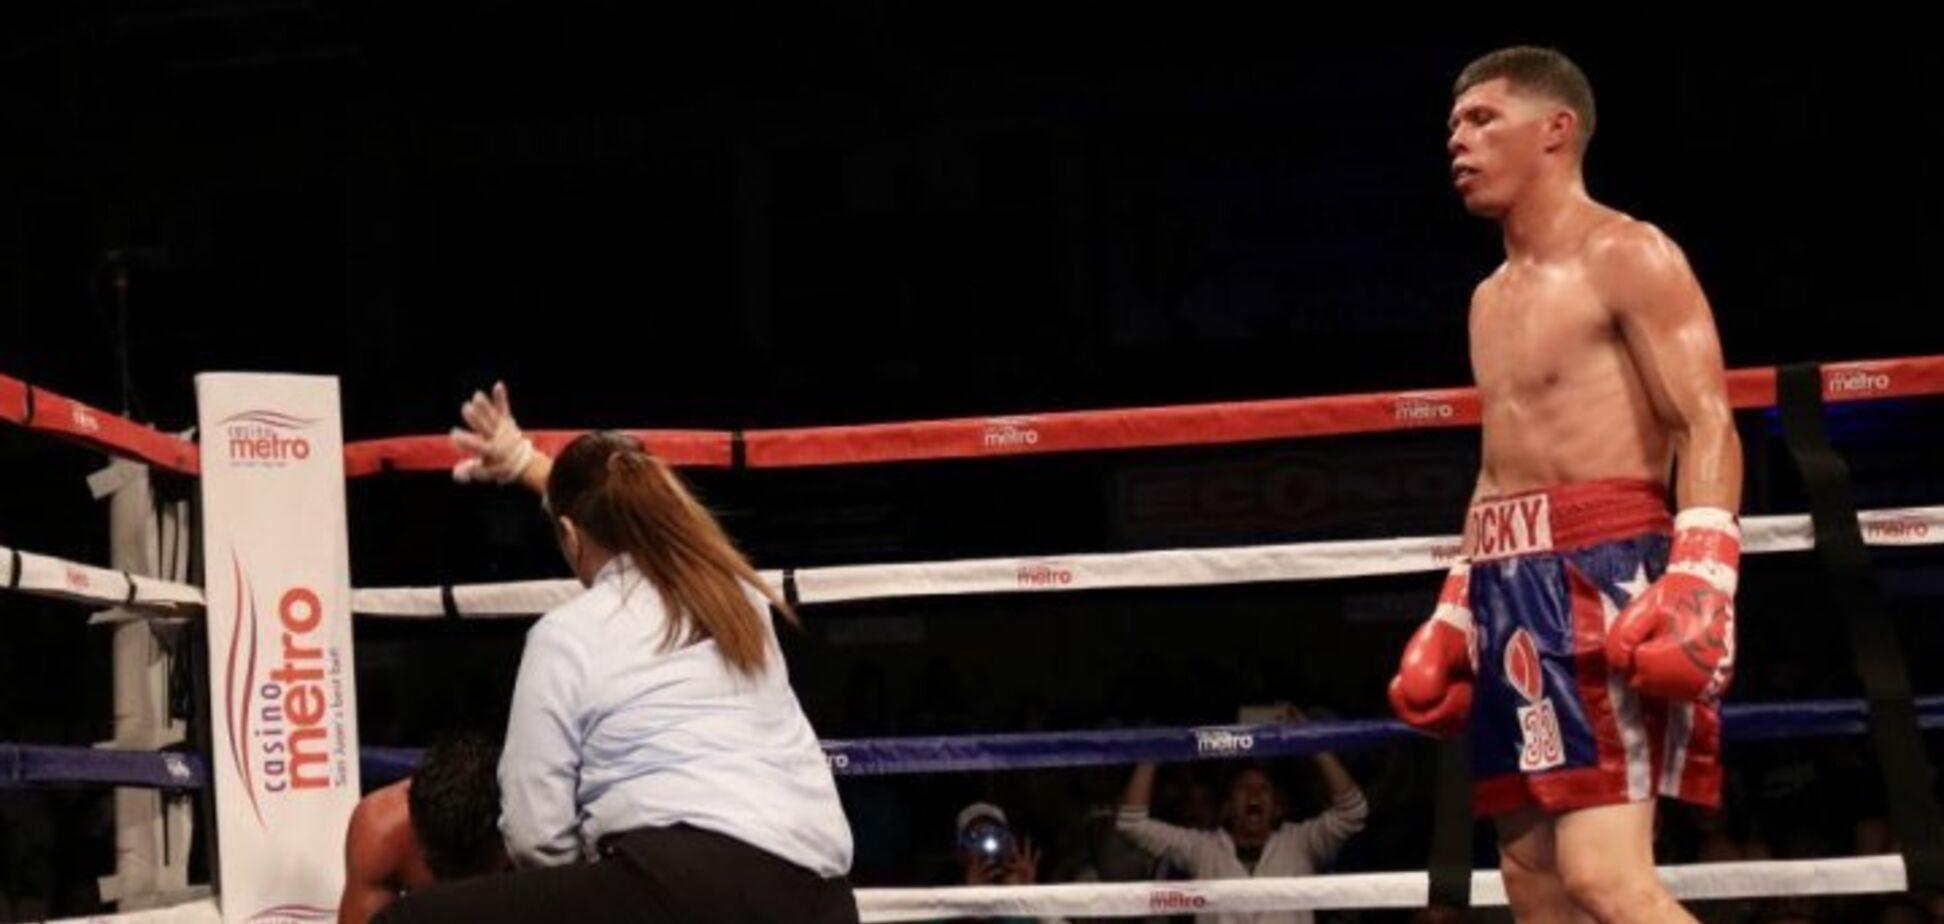 Побитий Ломаченком боксер повернувся на ринг ефектним нокаутом